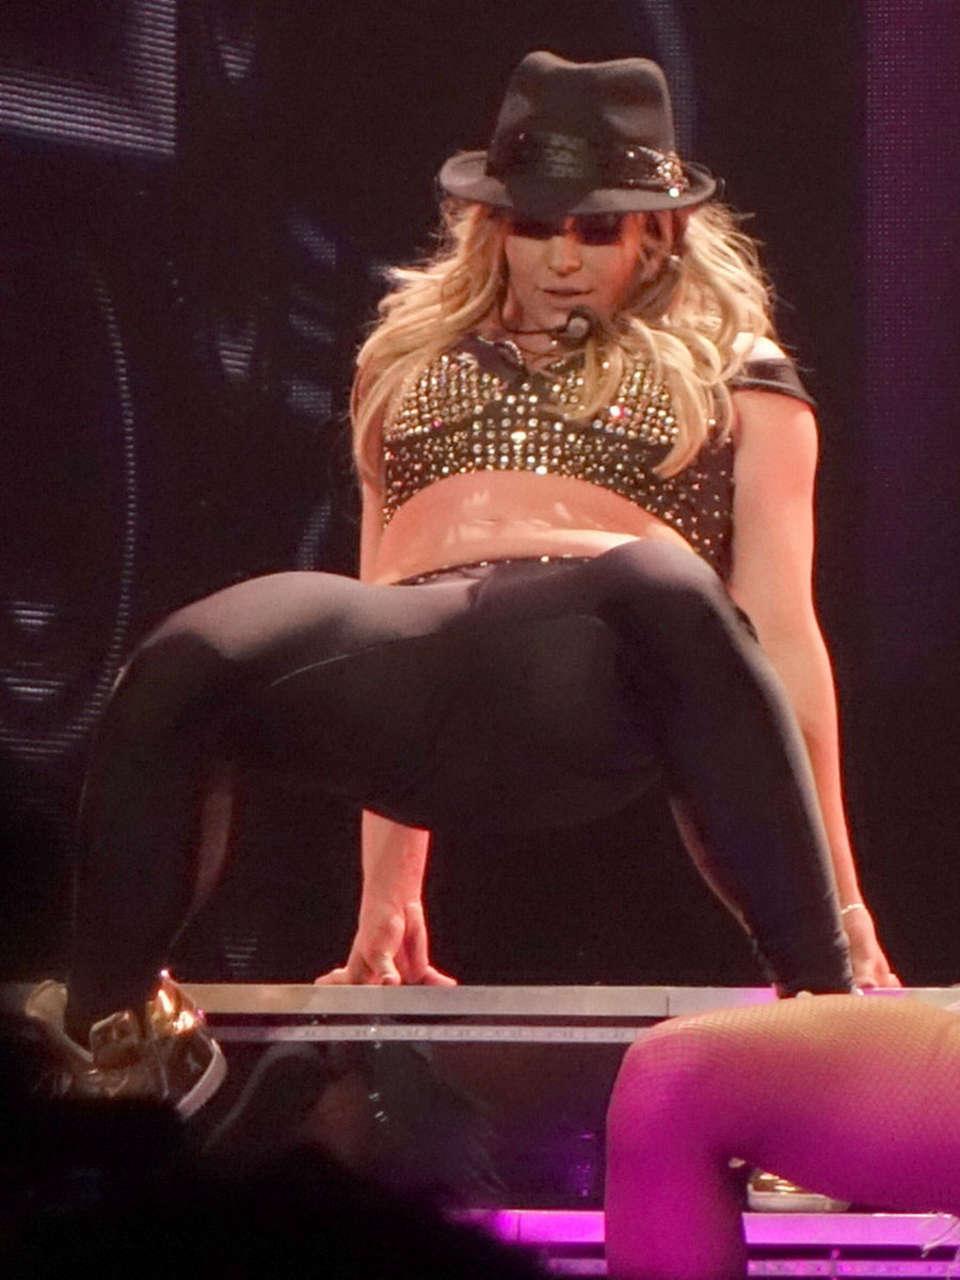 Britney Spears Piece Of Me Laser Pics -12 | GotCeleb